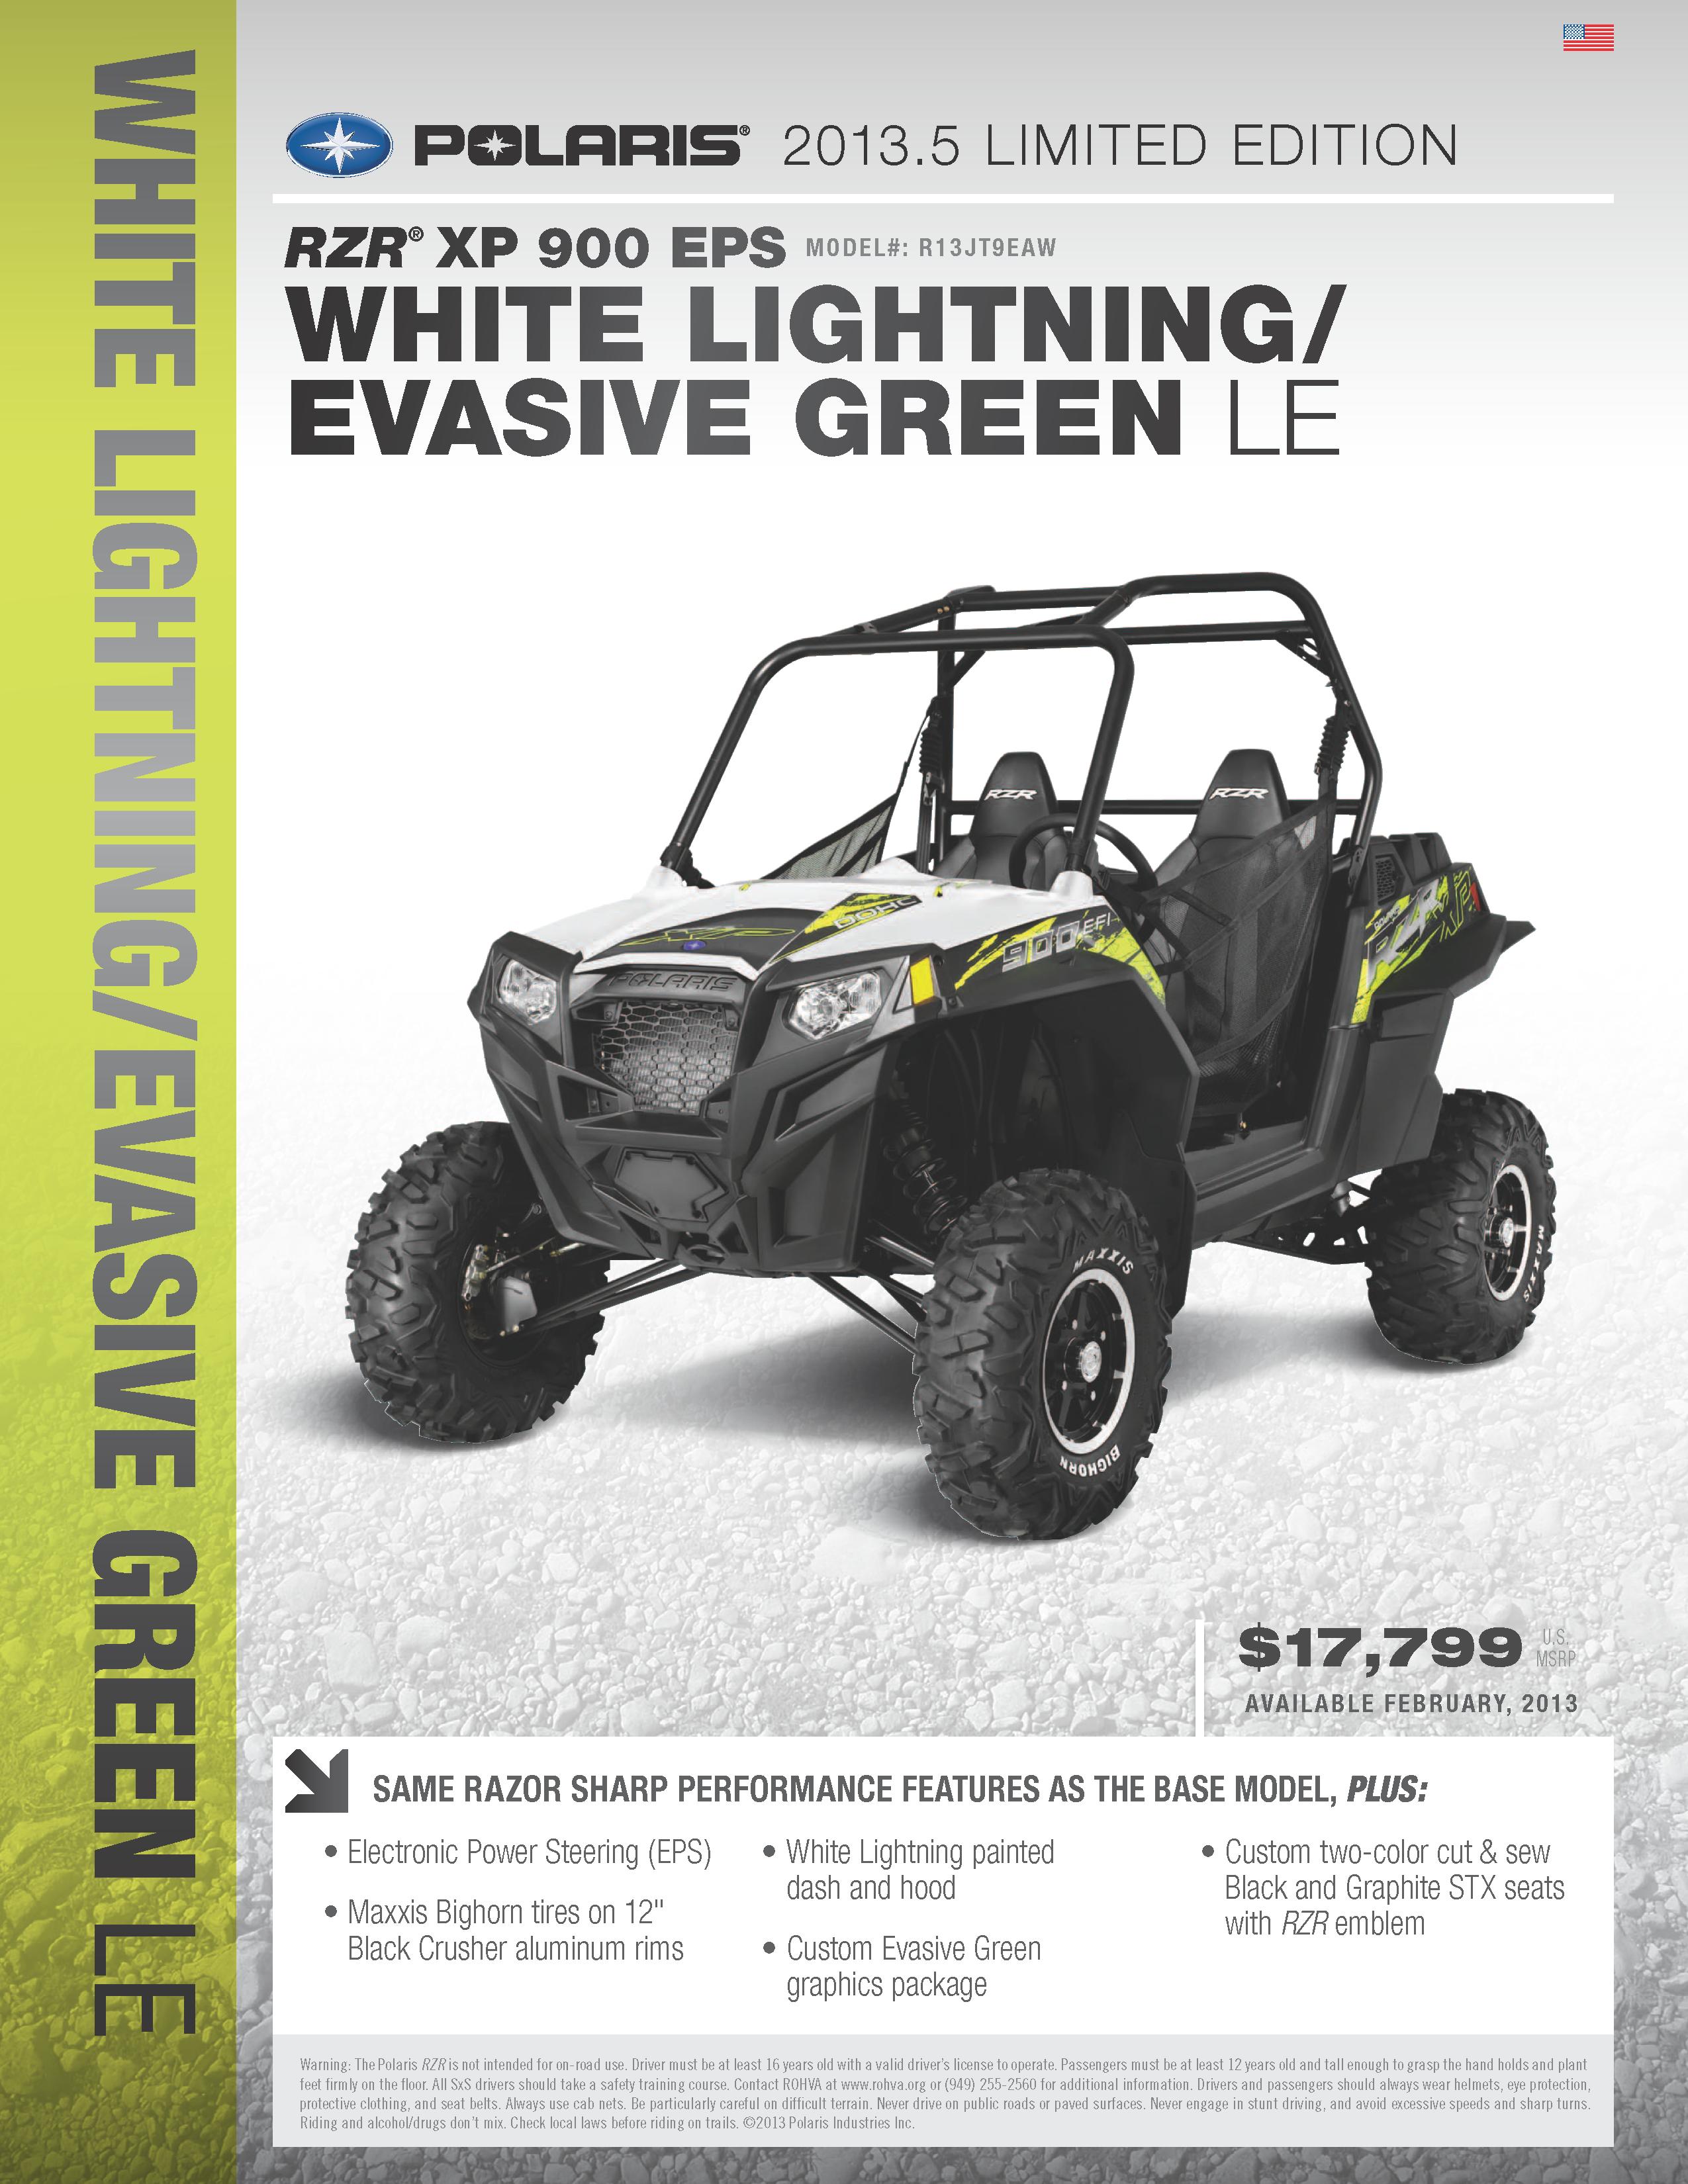 rzr xp 900 eps model r13jt9eaw white lightning evasive green le rh pinterest com 2014 rzr 900 xp owners manual 2014 rzr xp 900 service manual